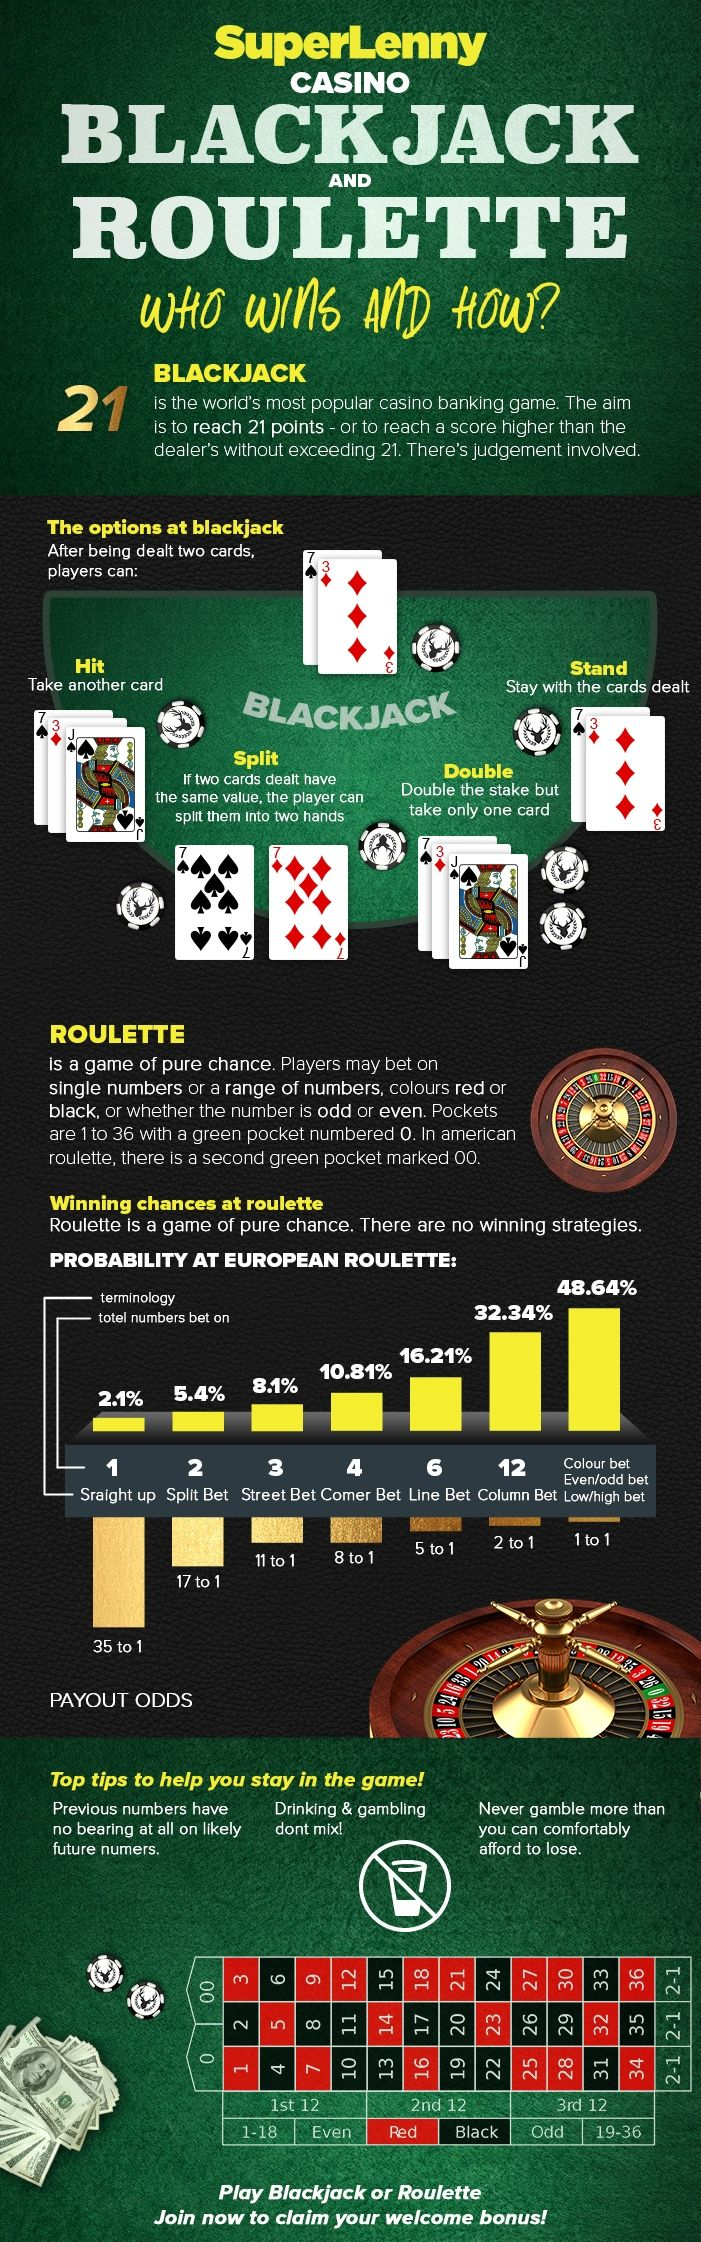 Blackjack betting strategy secrets punta bet365 soccer betting rules